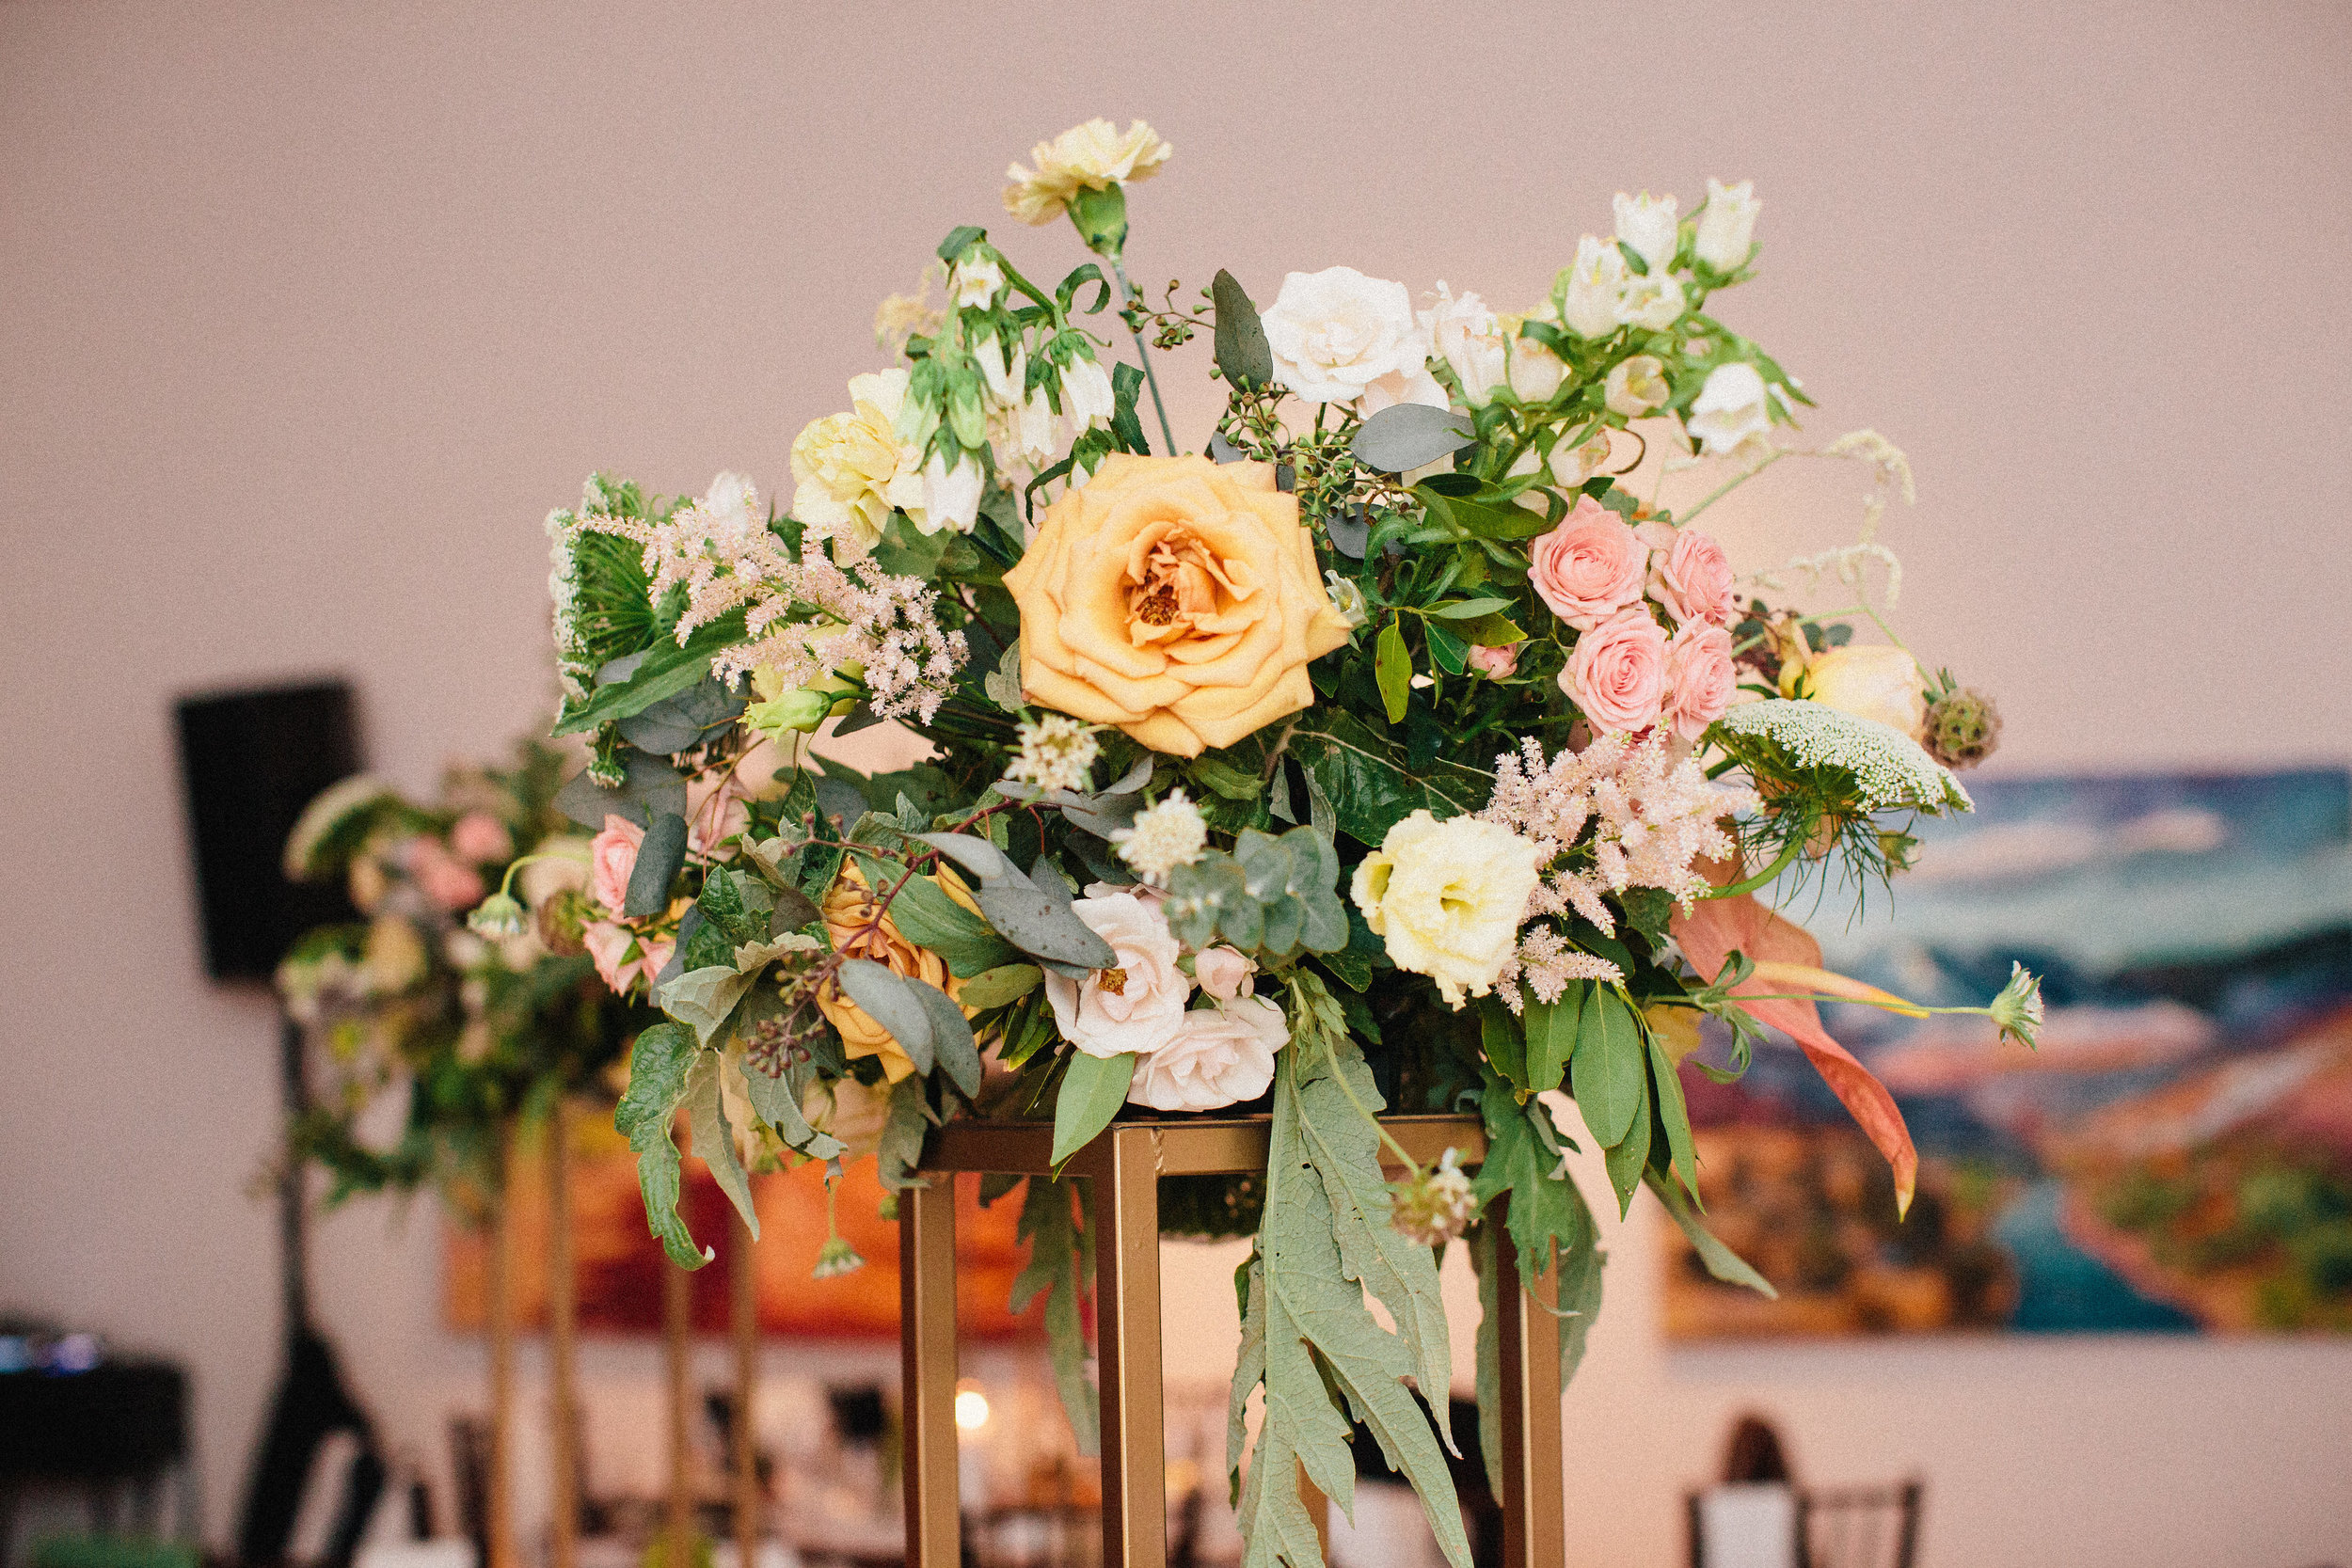 landry_lovelace_wedding_jbobephoto-1036.jpg